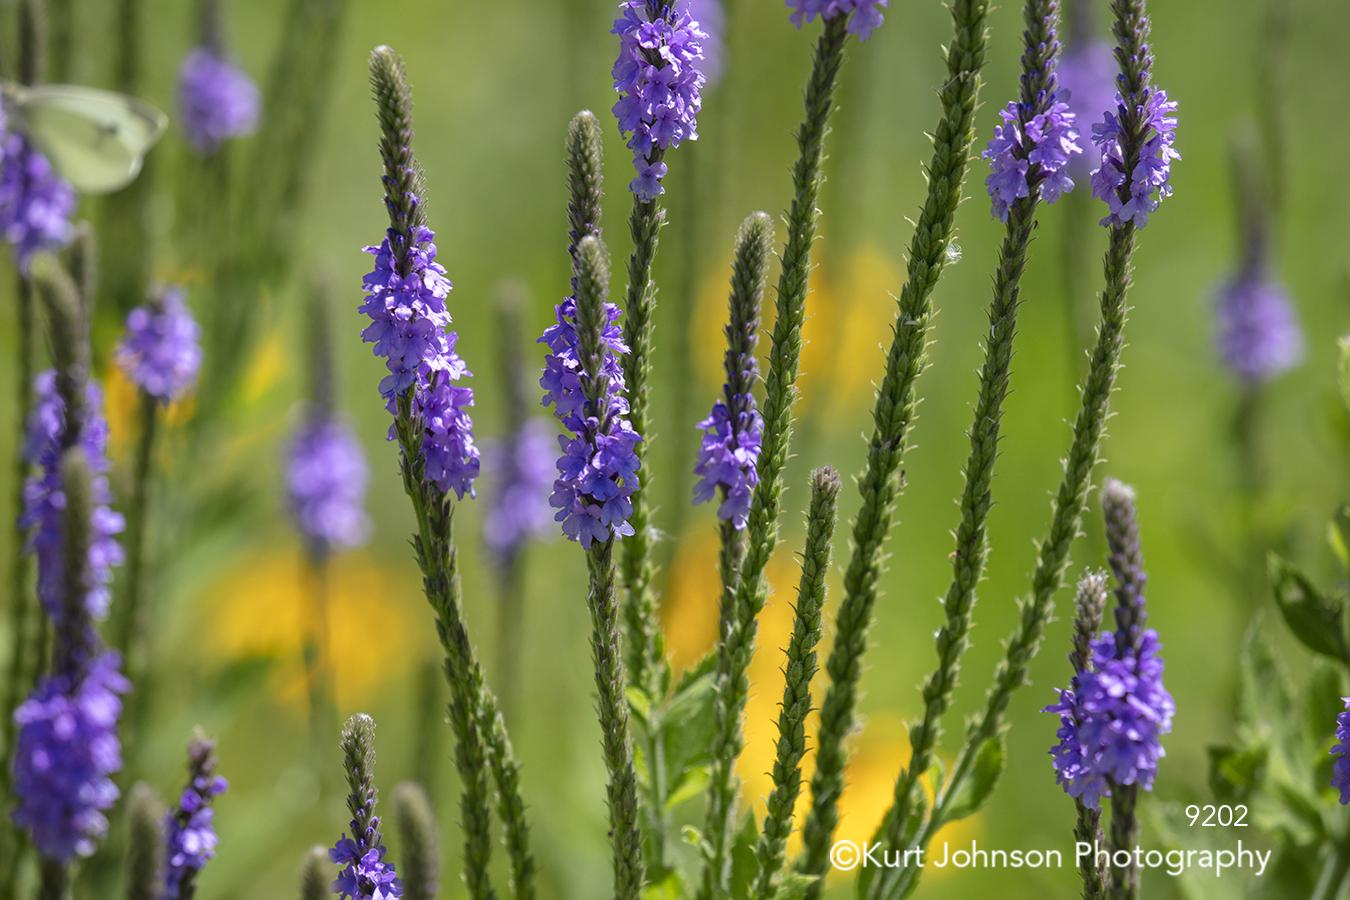 purple flowers pattern lines close up detail macro flower botanical green grass field